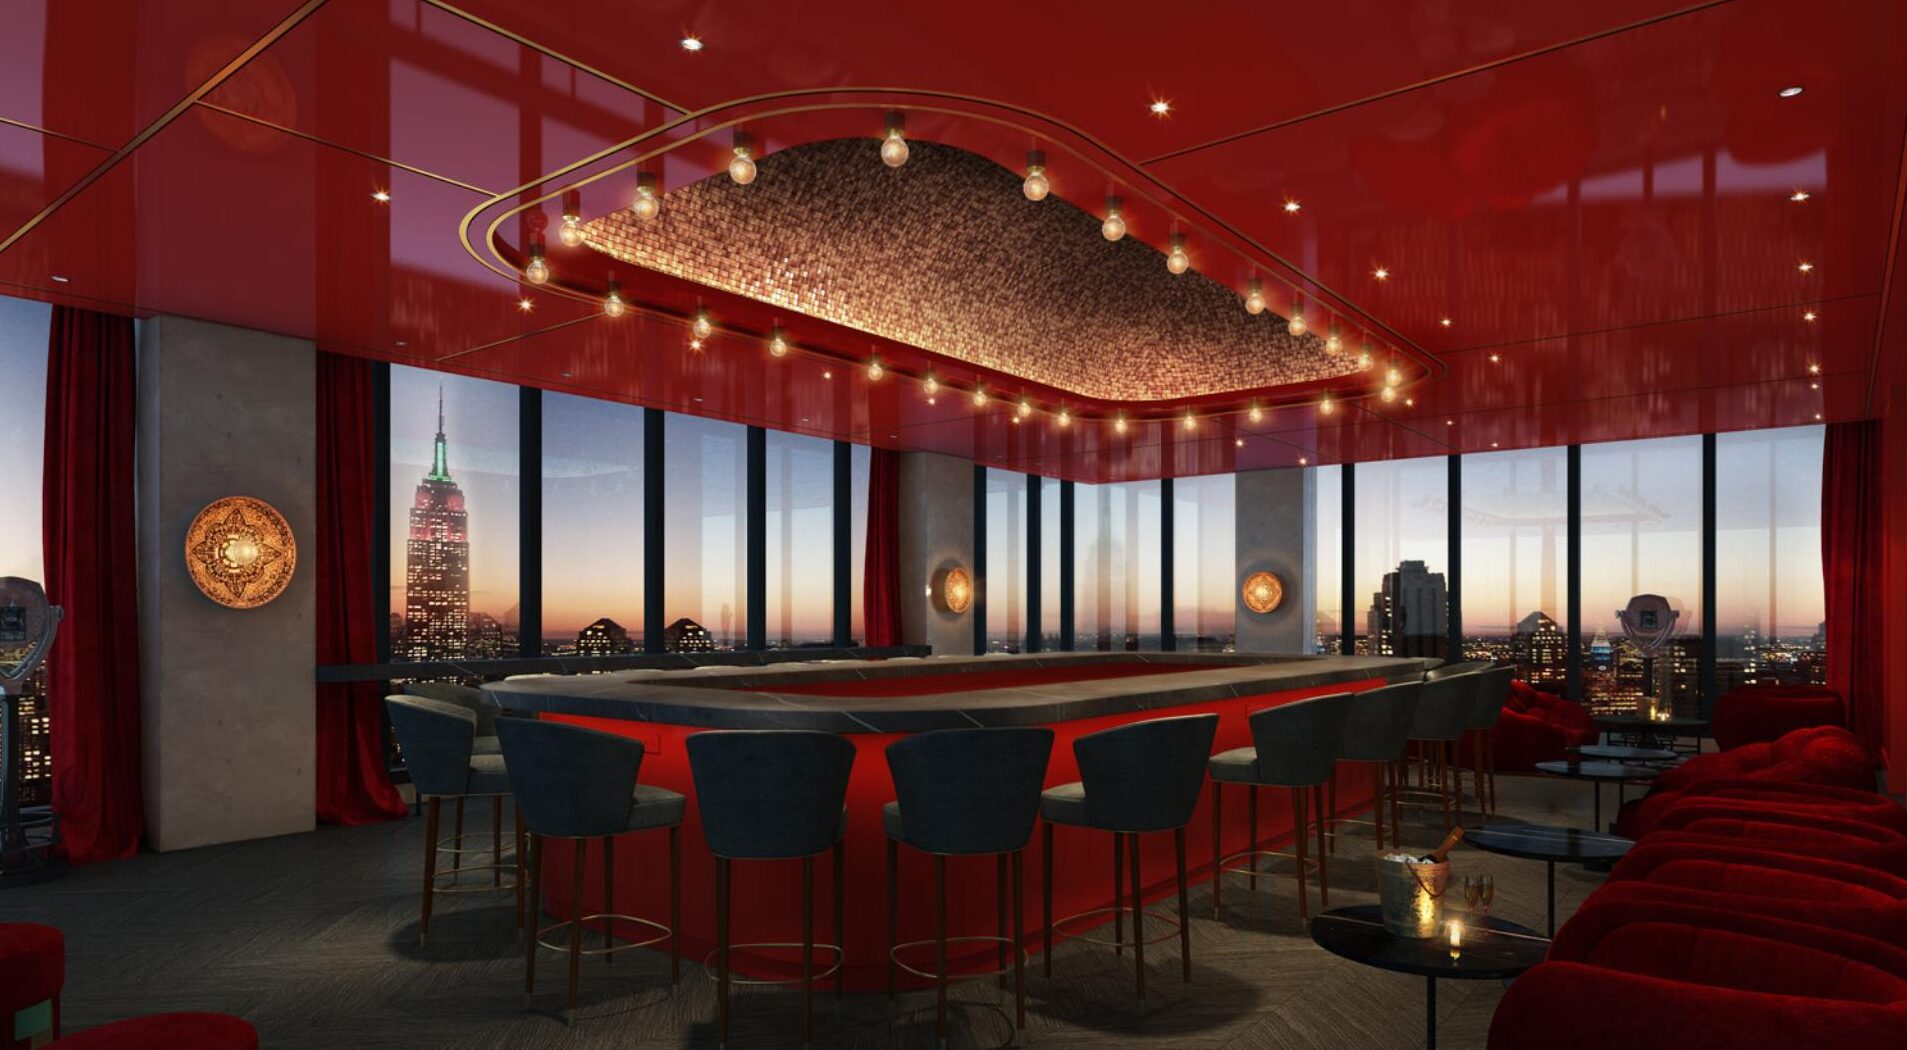 Virgin Hotels New York City roofftop bar